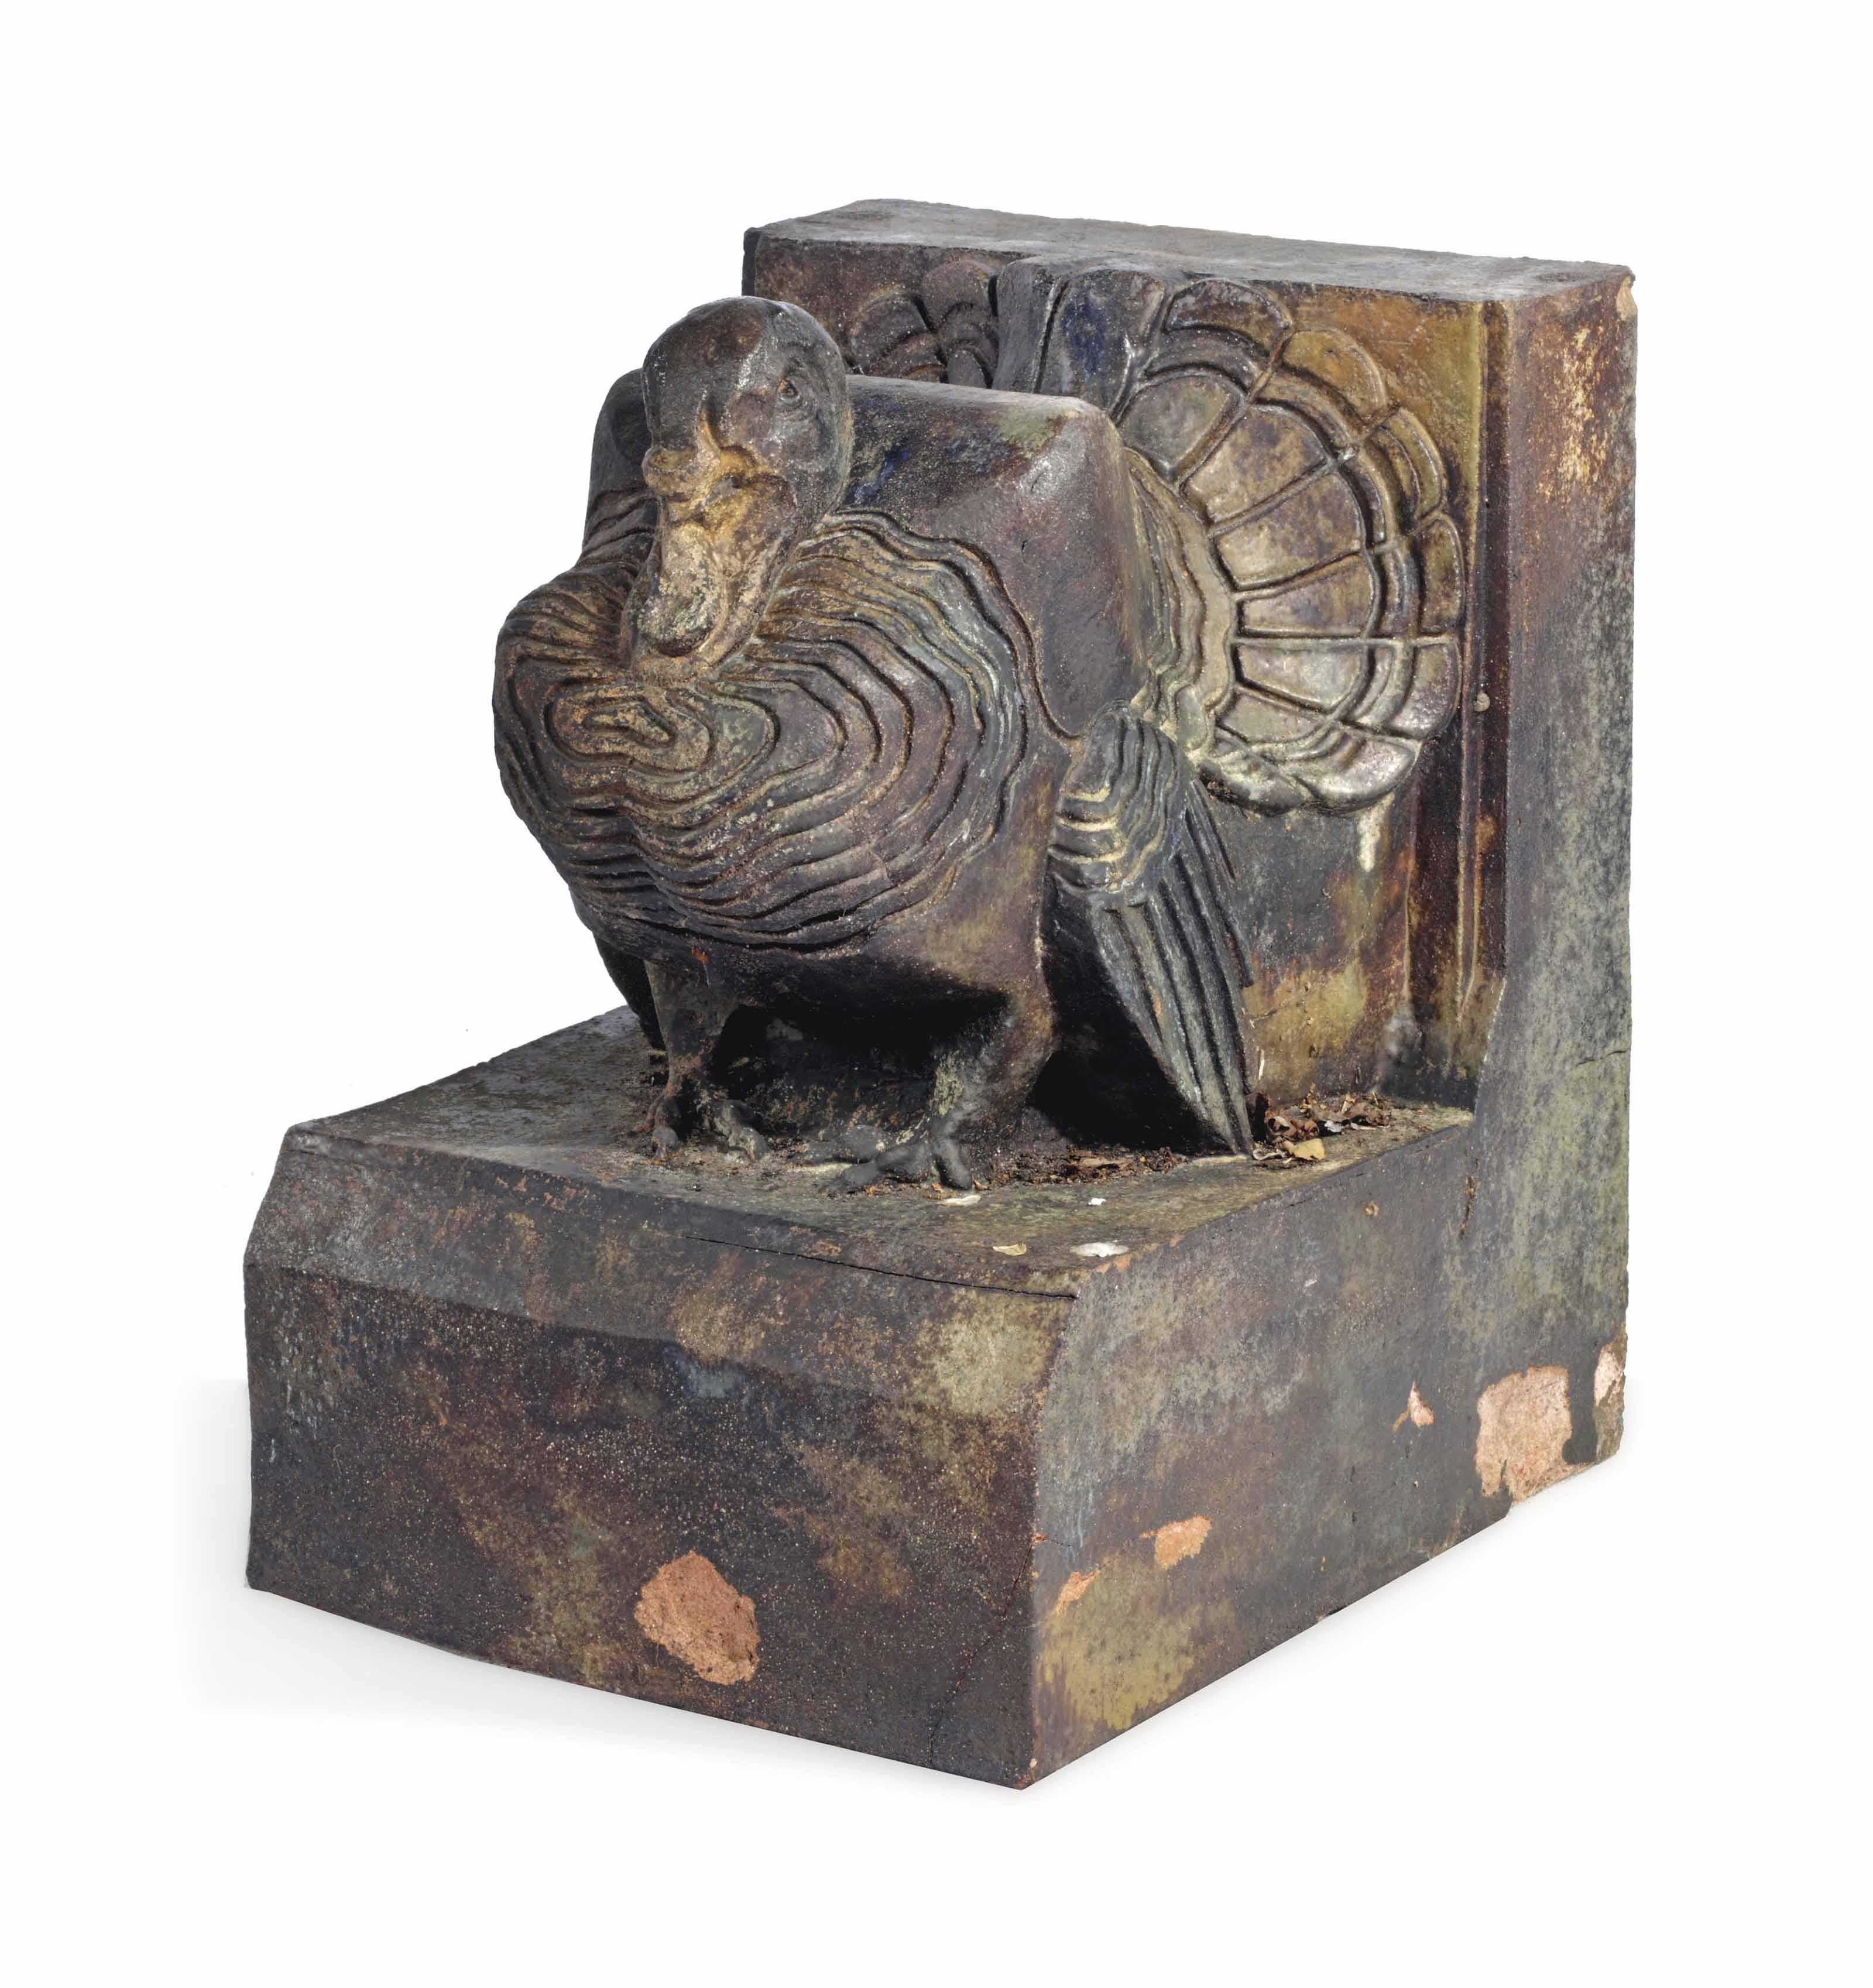 A turkey cock